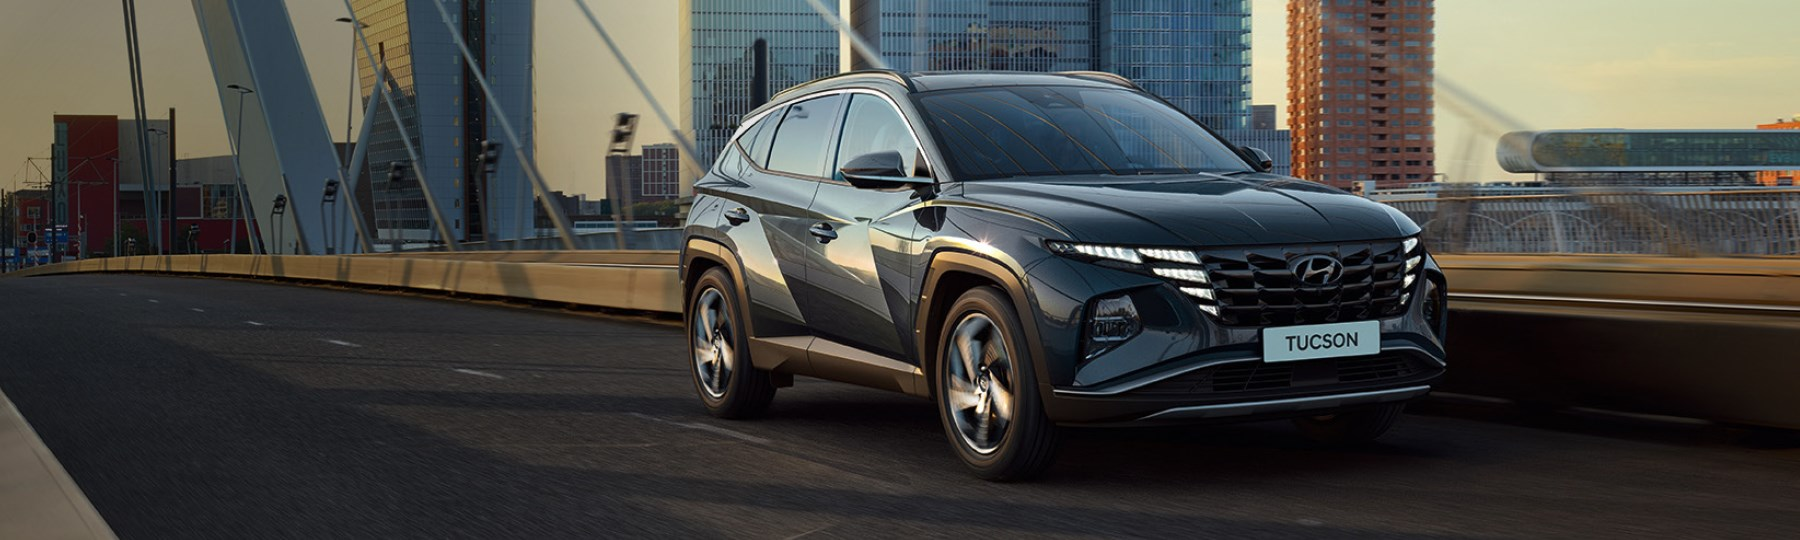 Hyundai Header Tucson-1800x540px